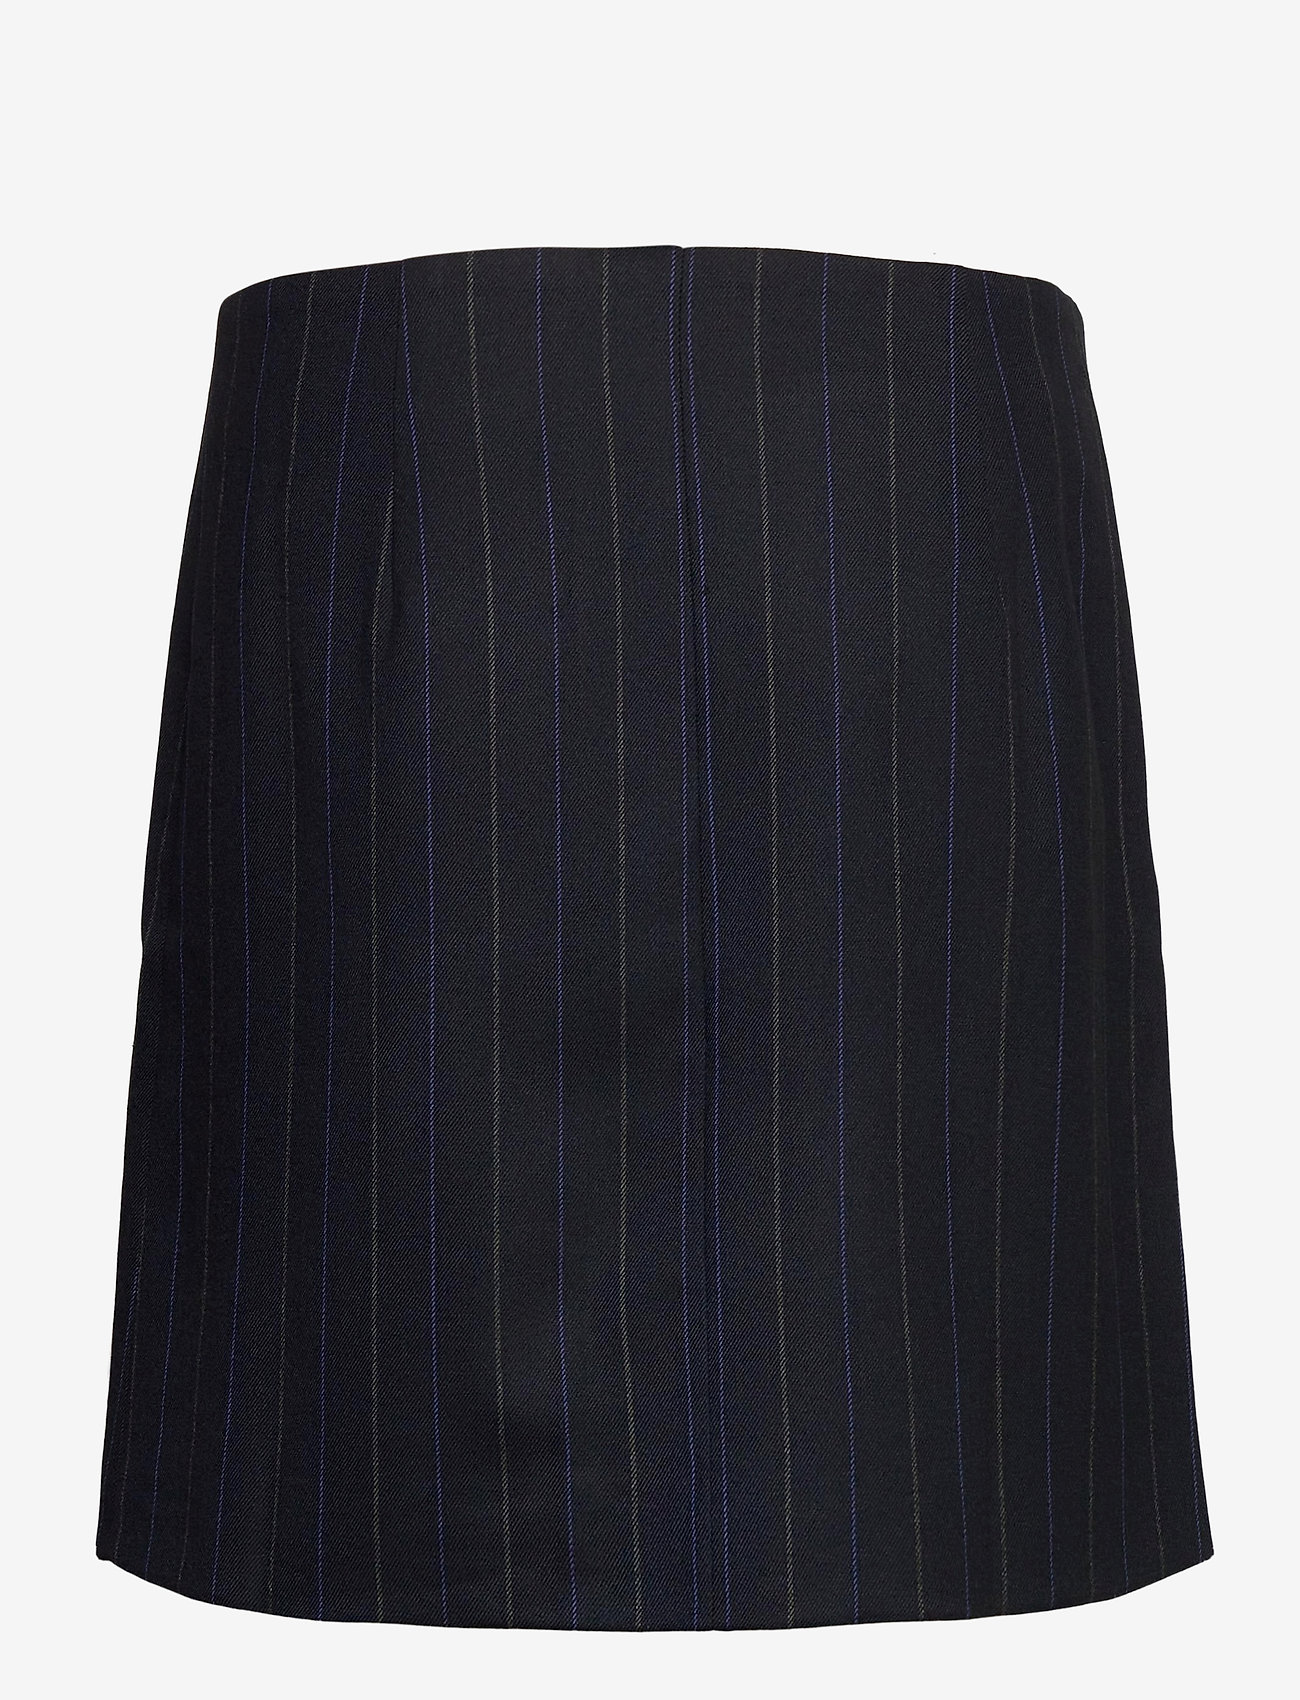 NORR - Jody skirt - korta kjolar - navy pinstripe - 1